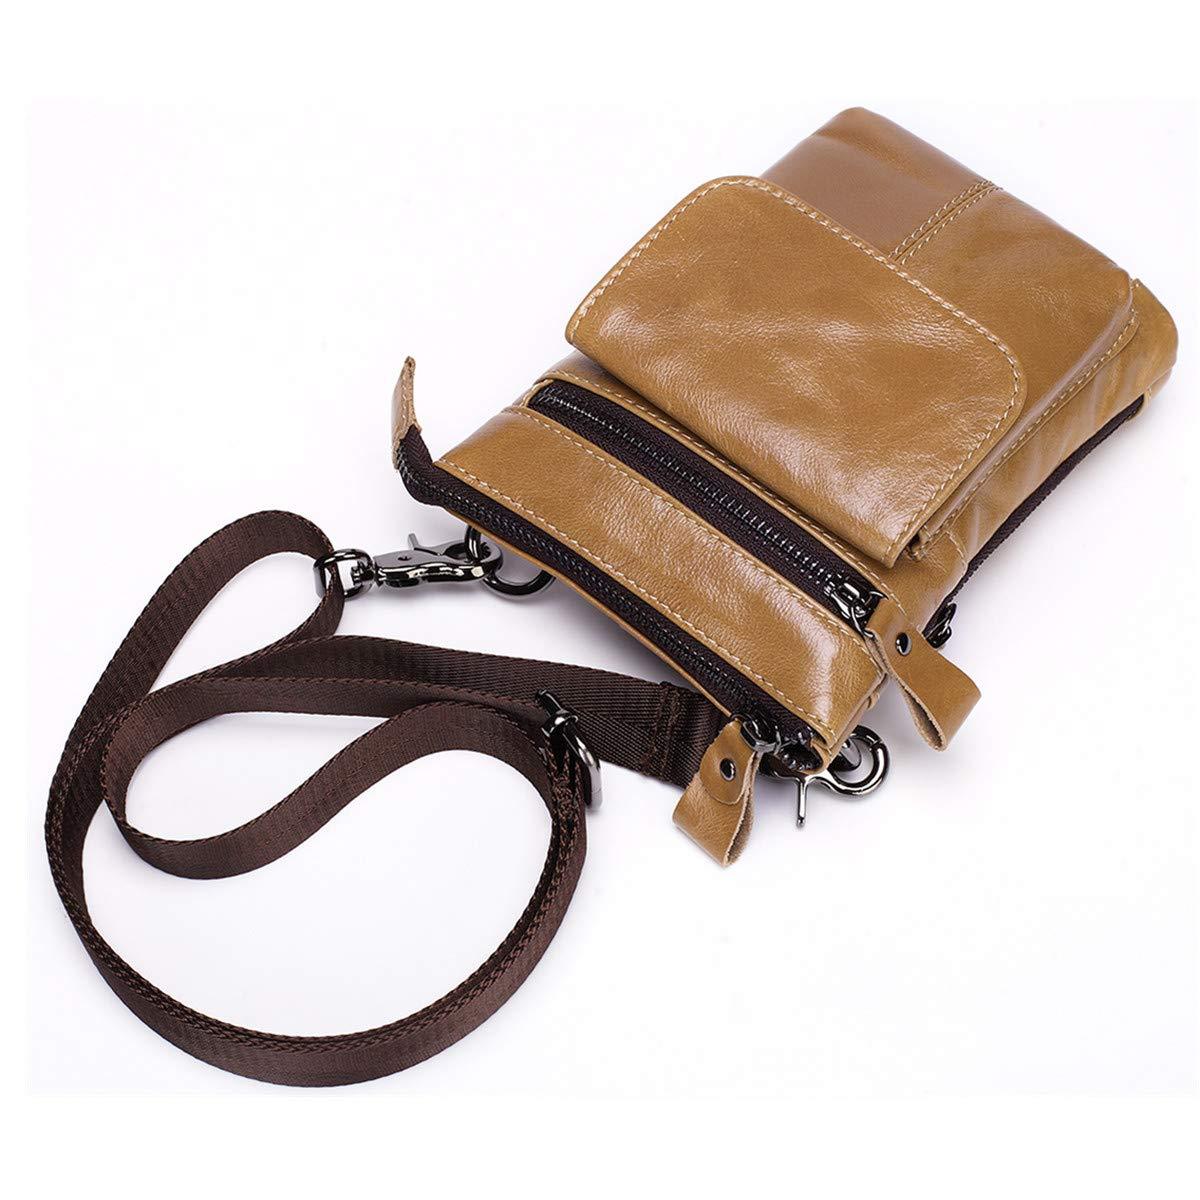 LJYH coffee Mens Sling Leather Purse Shoulder Bag Casual Crossbody Bag Travel Bussiness Bag